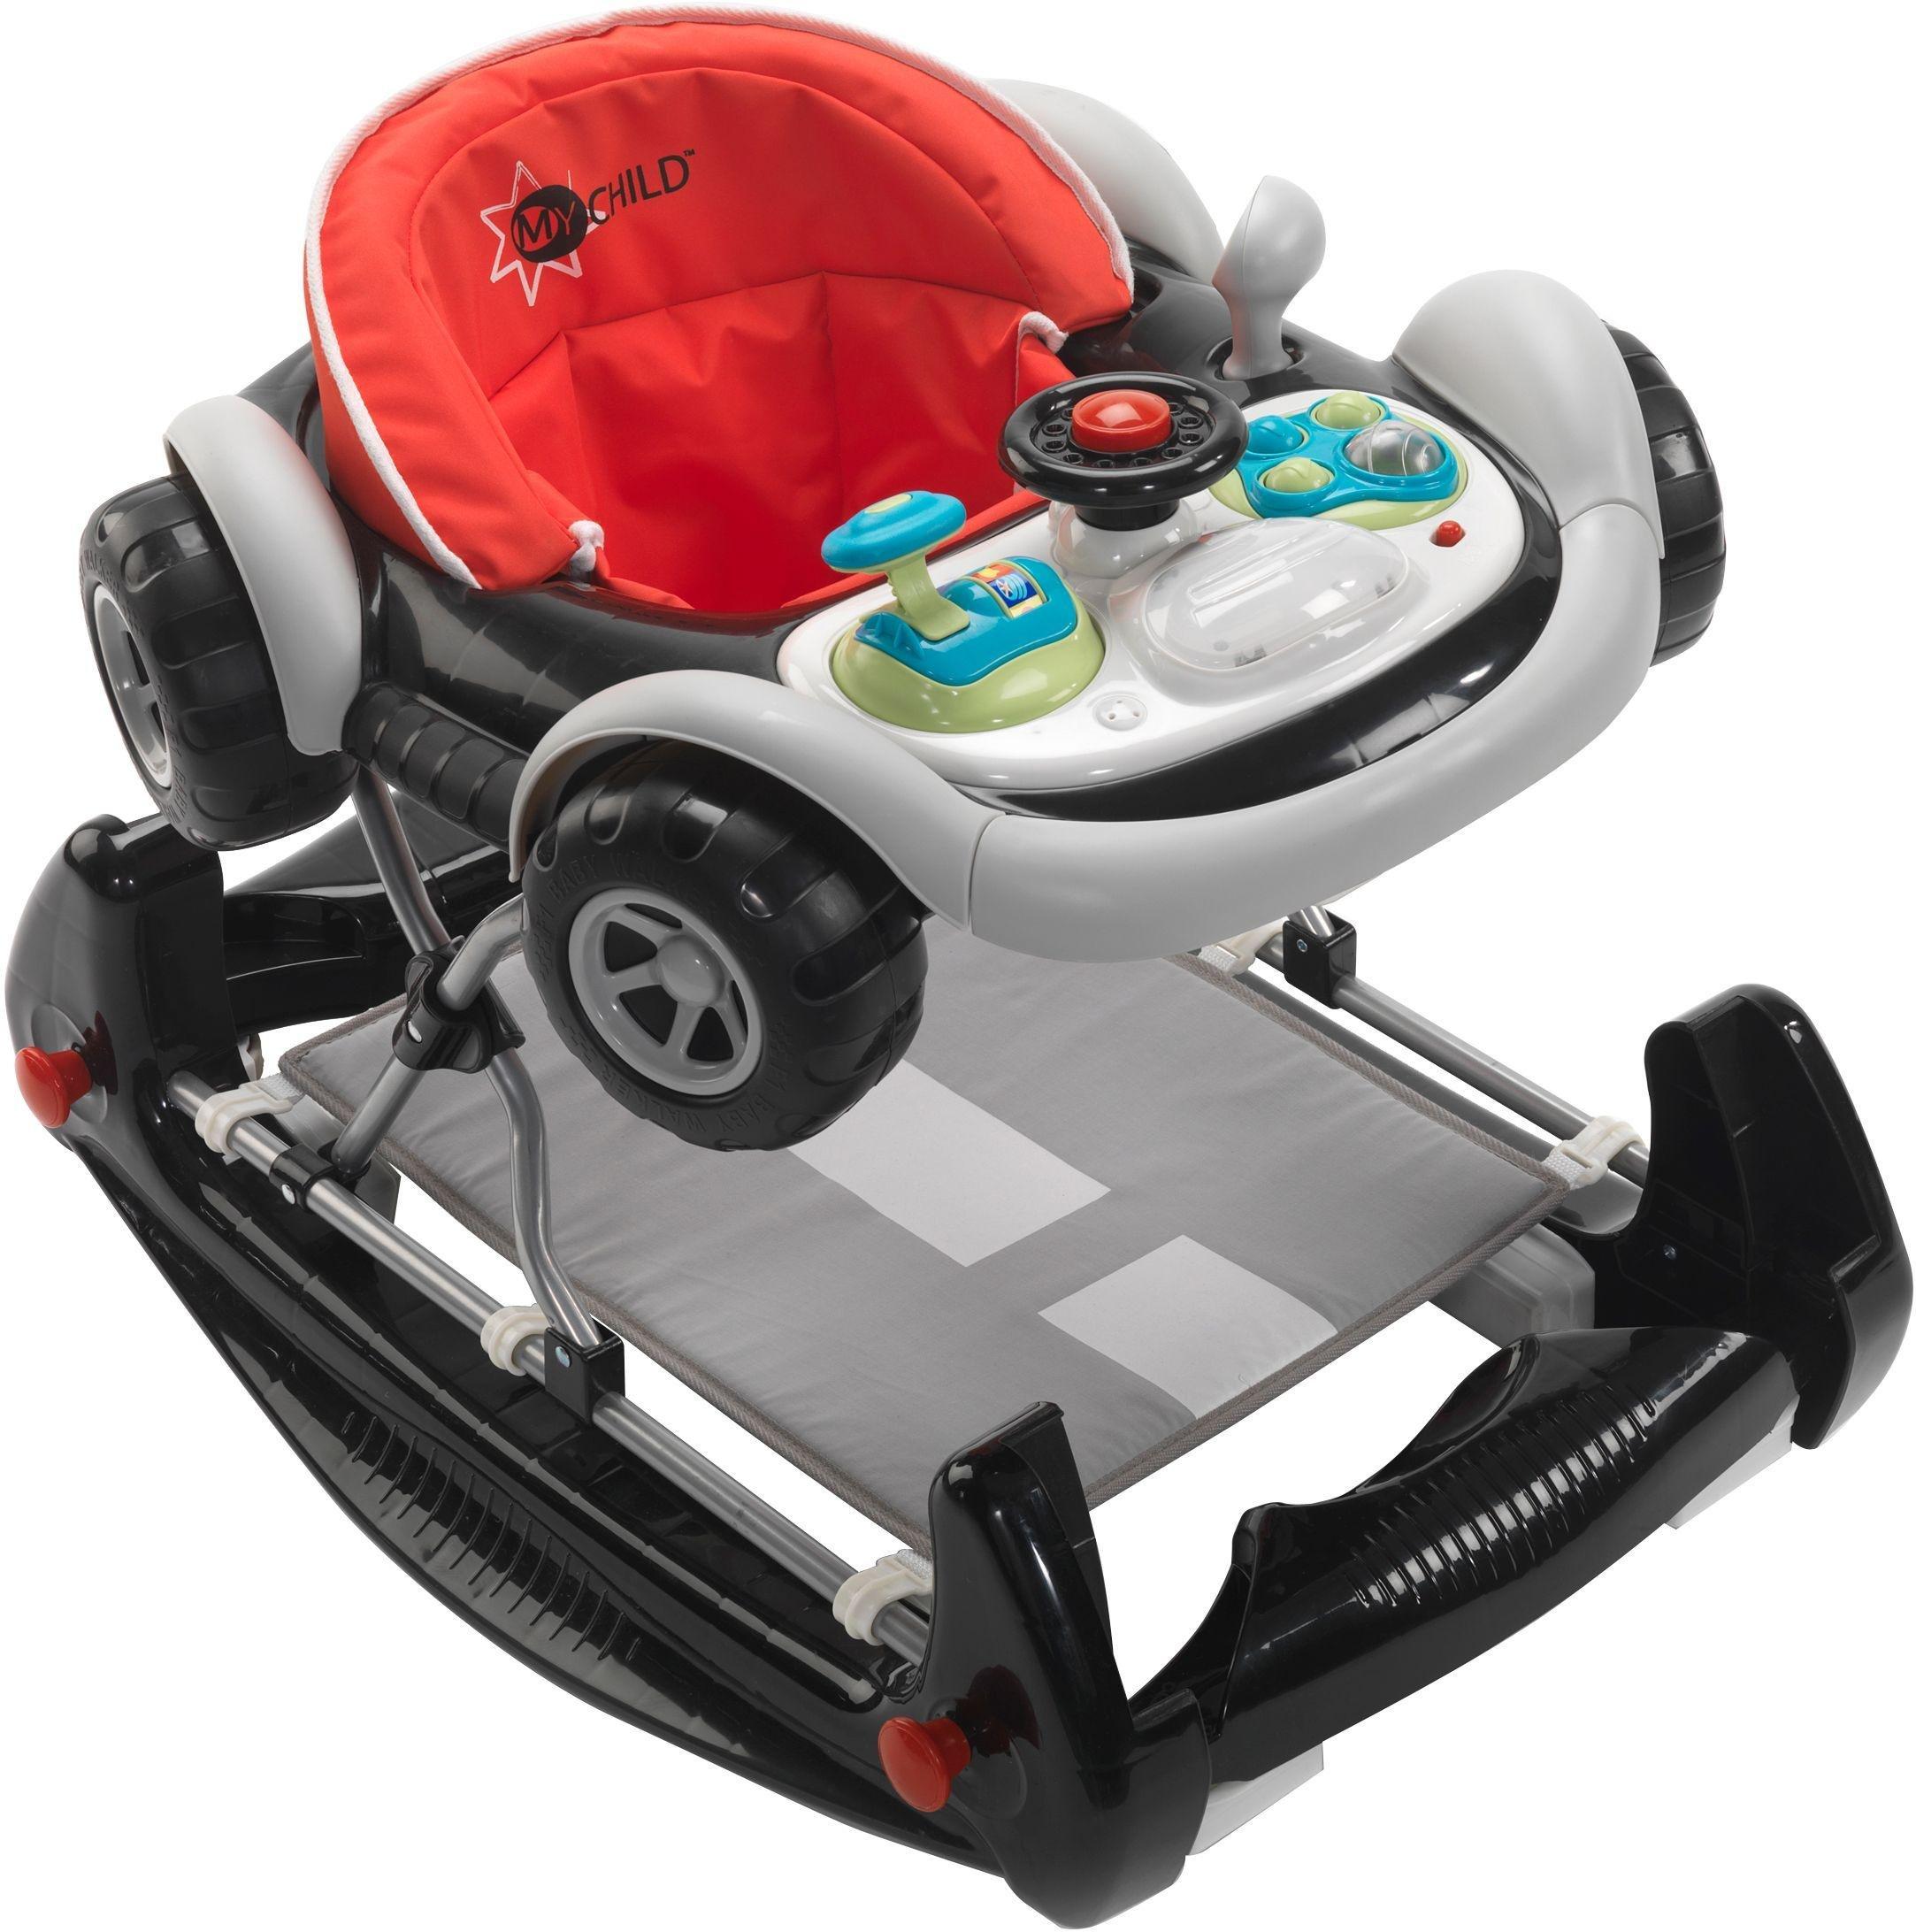 MyChild Coupe 2 In 1 Baby Walker - Black